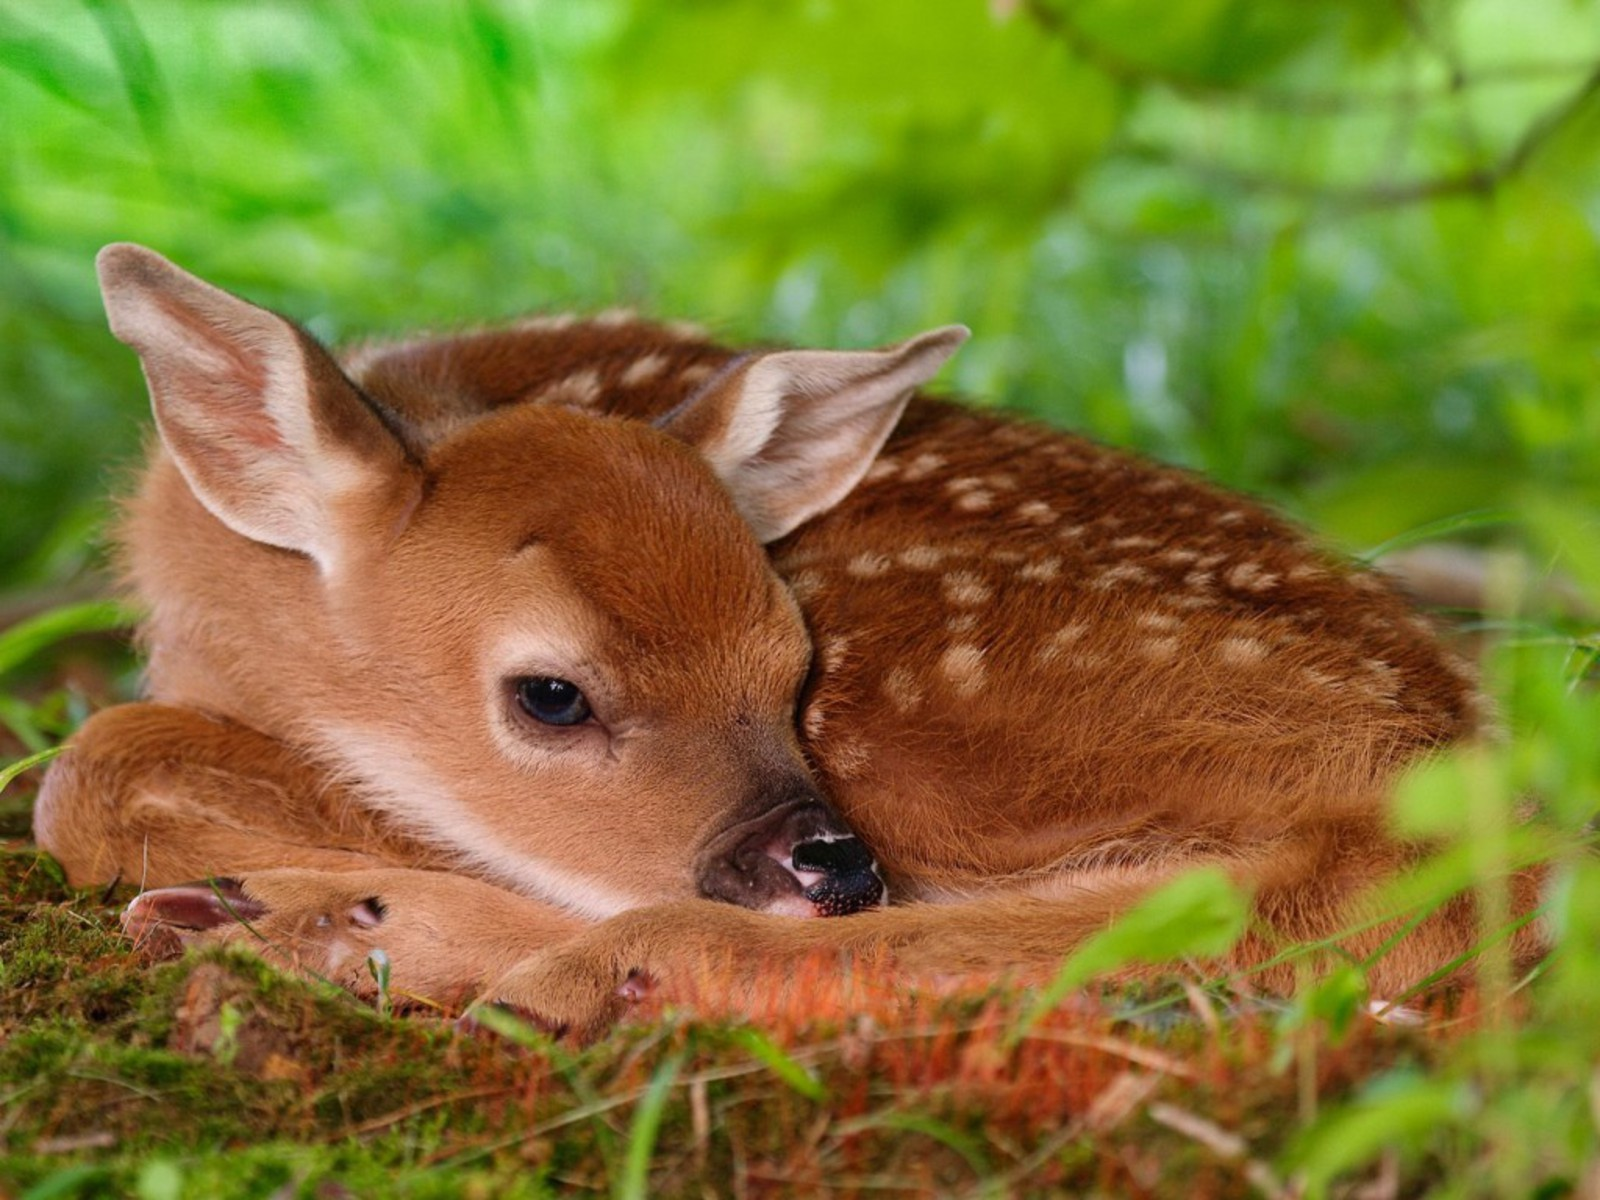 http://2.bp.blogspot.com/_EAViqbzwc_s/TN_PsM9PuuI/AAAAAAAACBs/LHcydAUiVSc/s1600/Animals_Beasts__002583_.jpg